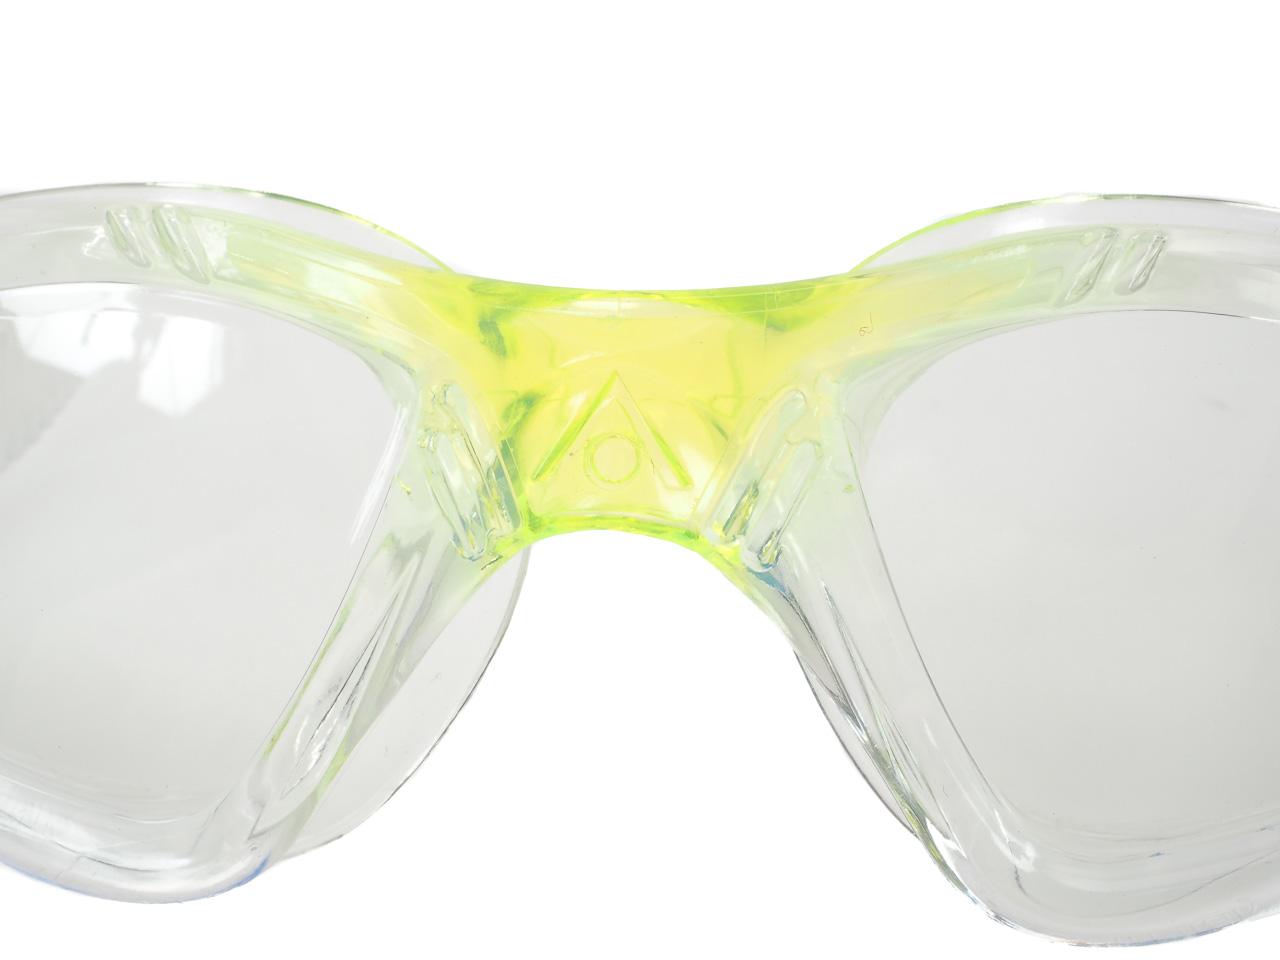 Brille-Bade-Schwimmbad-Aqua-sphere-Kayenne-Jr-Transparent-Lme-CL-L-Weiss-87372 Indexbild 4